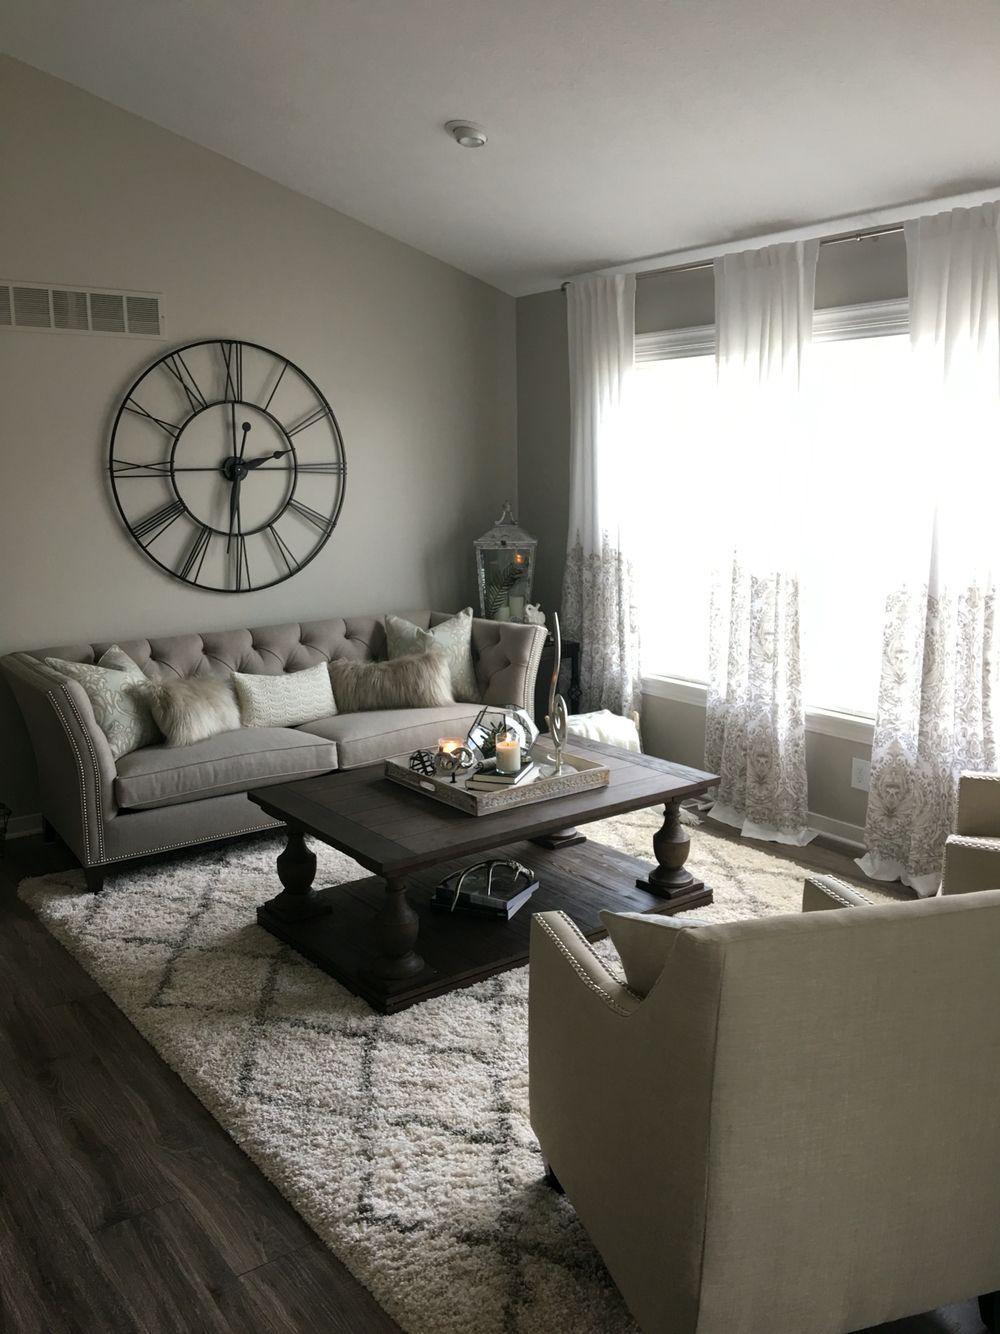 XXL wall clock. Shelton sofa. Living room. Cozy My dream